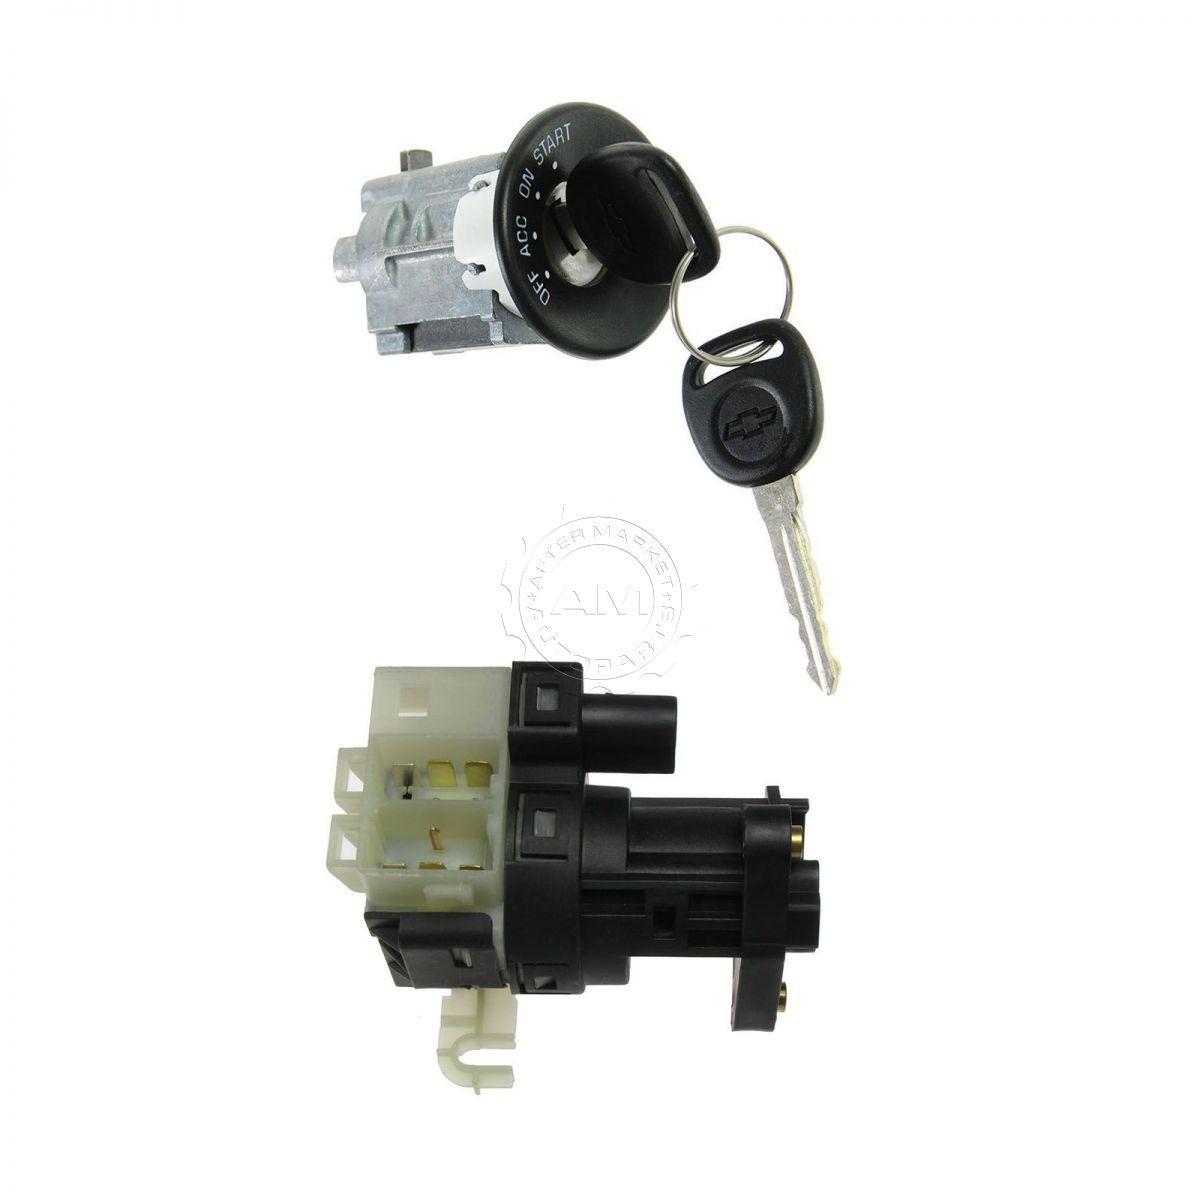 ignition switch lock cylinder w key kit for impala. Black Bedroom Furniture Sets. Home Design Ideas